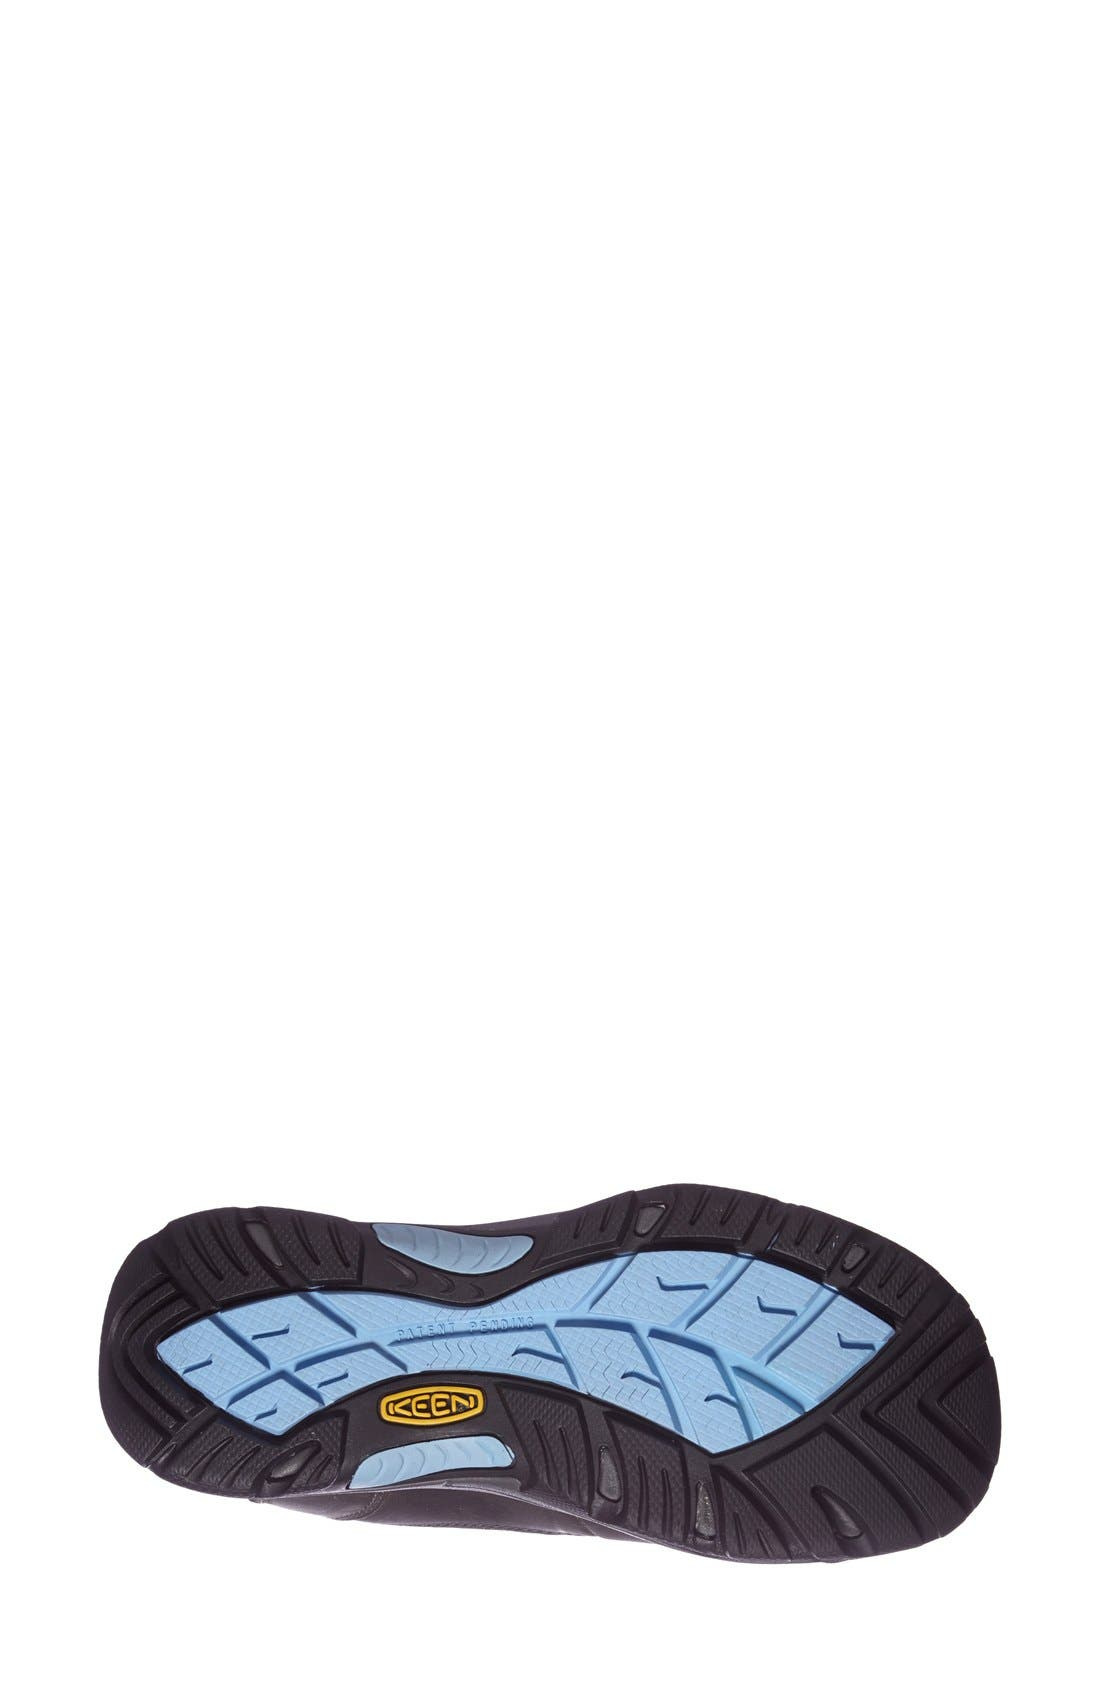 Alternate Image 4  - Keen 'Revel II' Waterproof Snow Boot (Women)